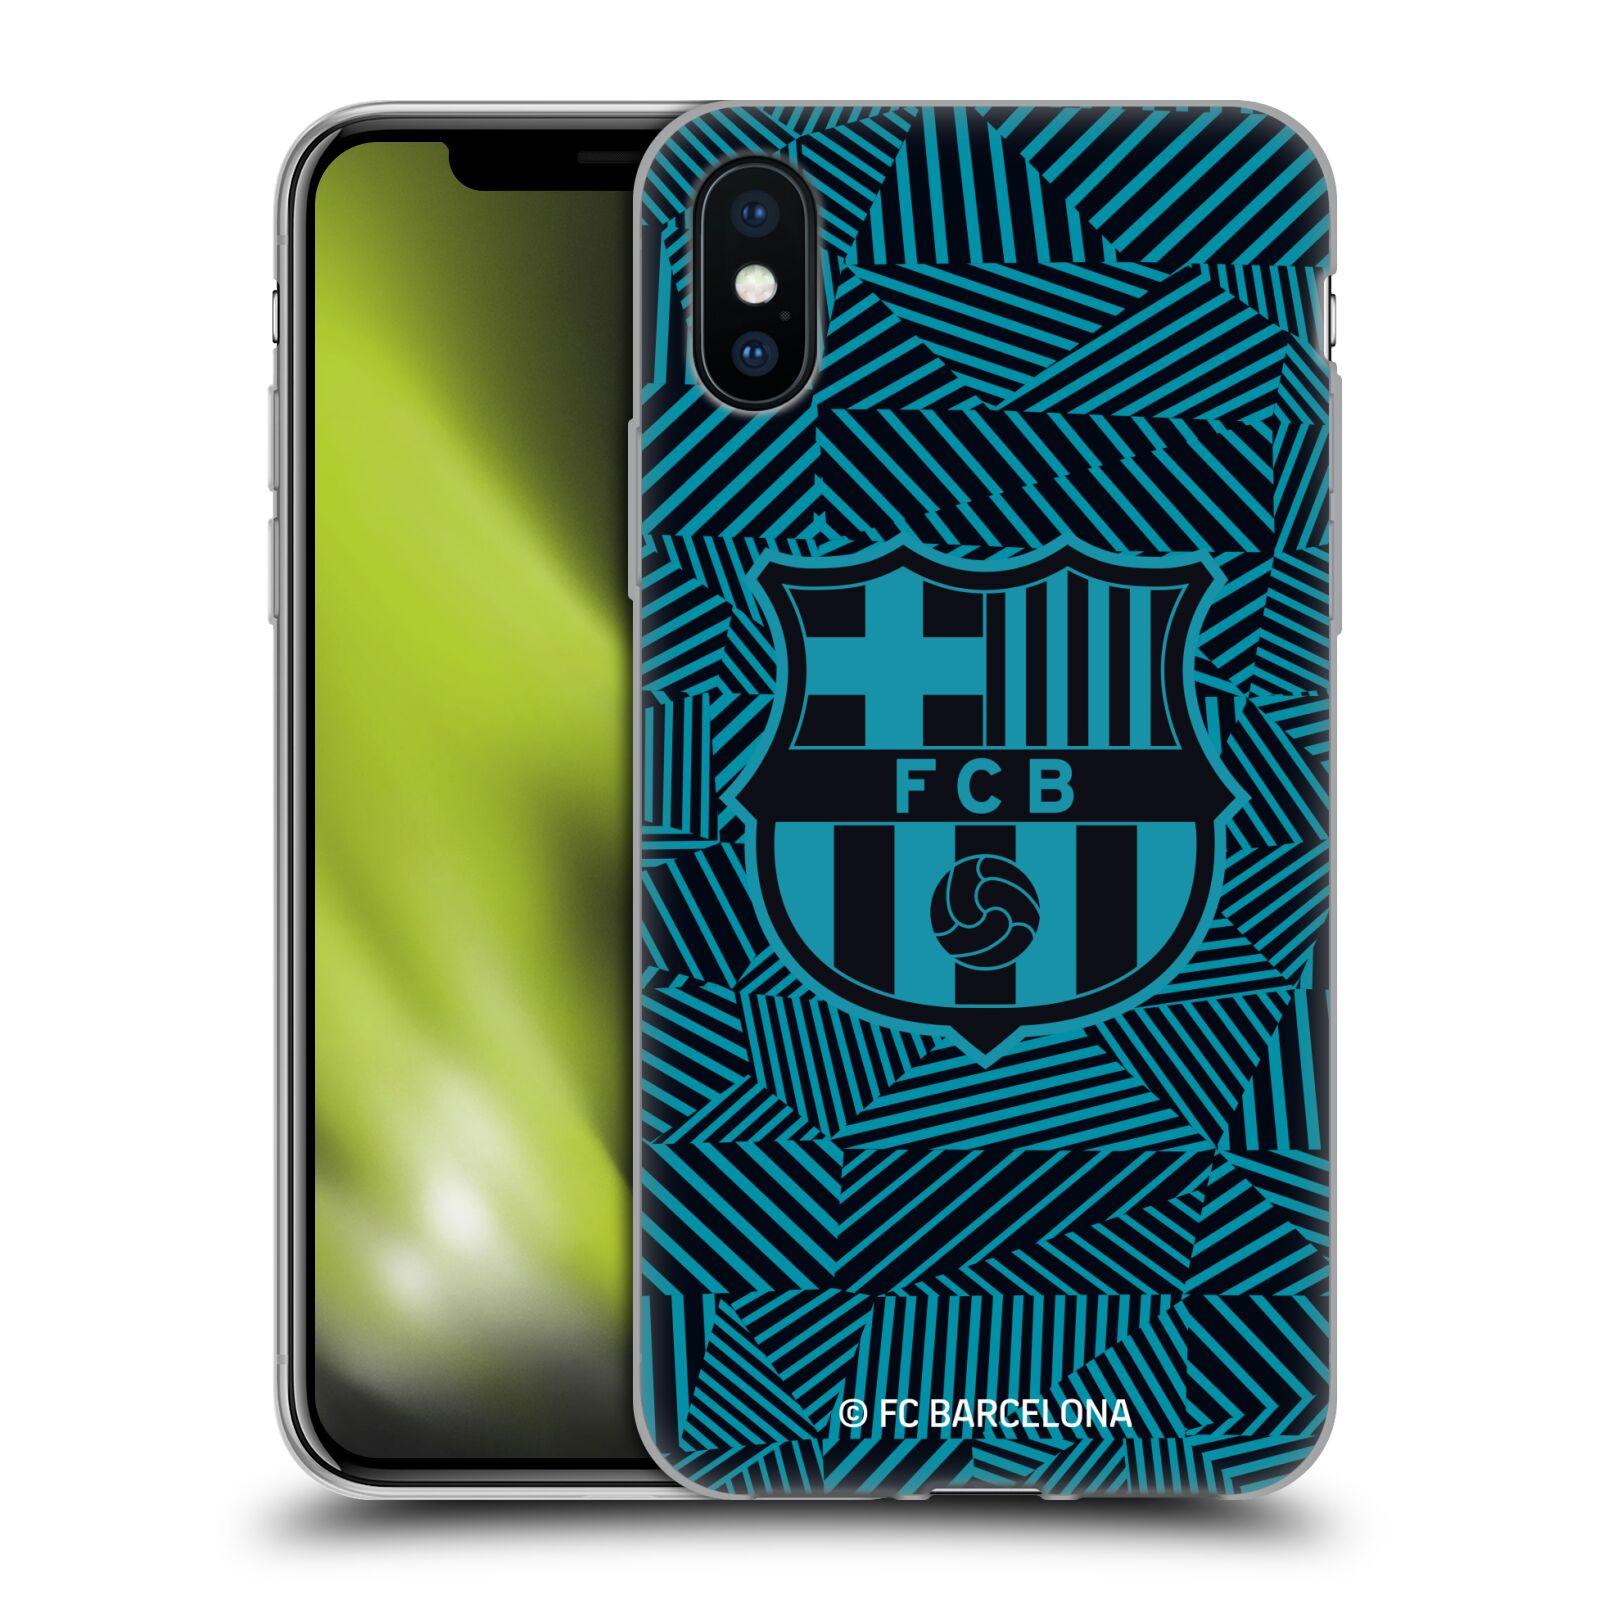 Oficial-FC-Barcelona-2017-18-Crest-suave-Gel-caso-para-Apple-Iphone-Telefonos